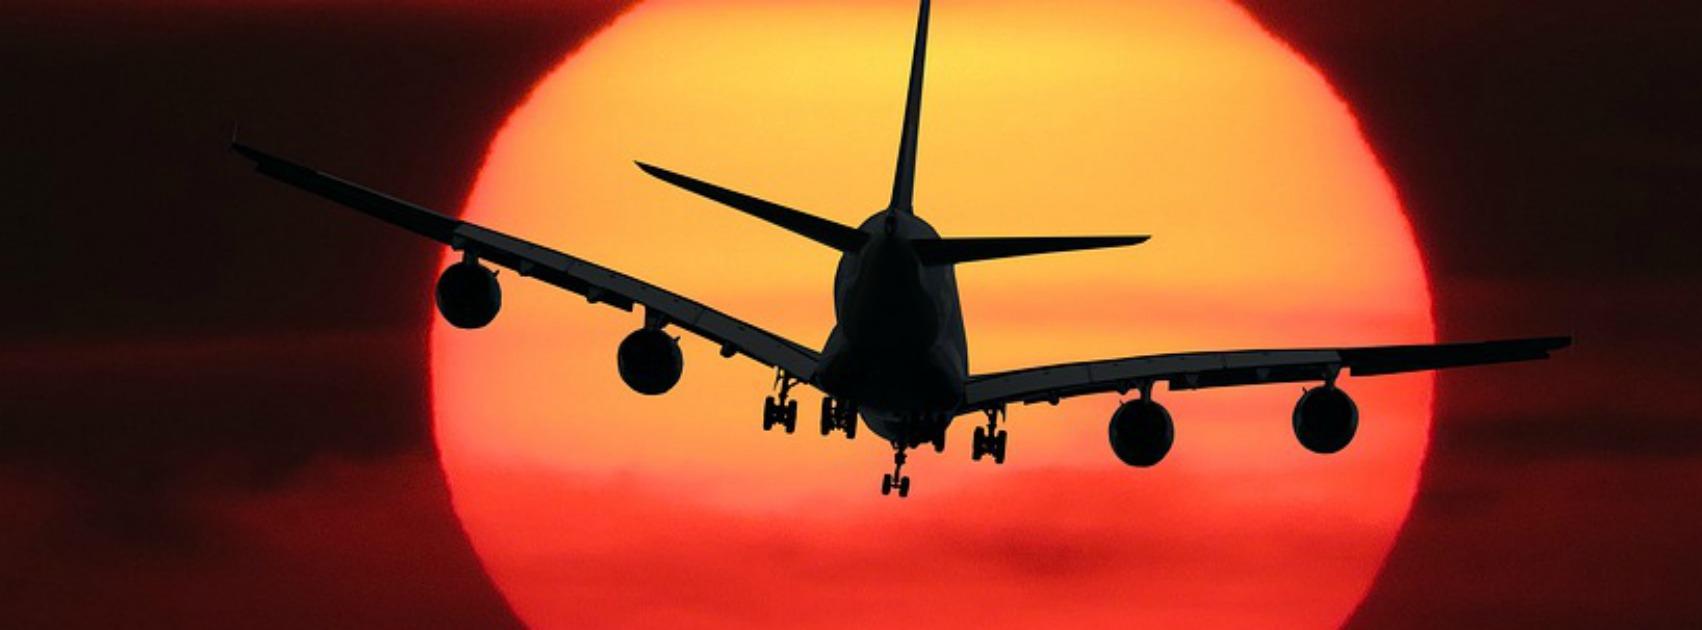 Flugzeug im Abendrot